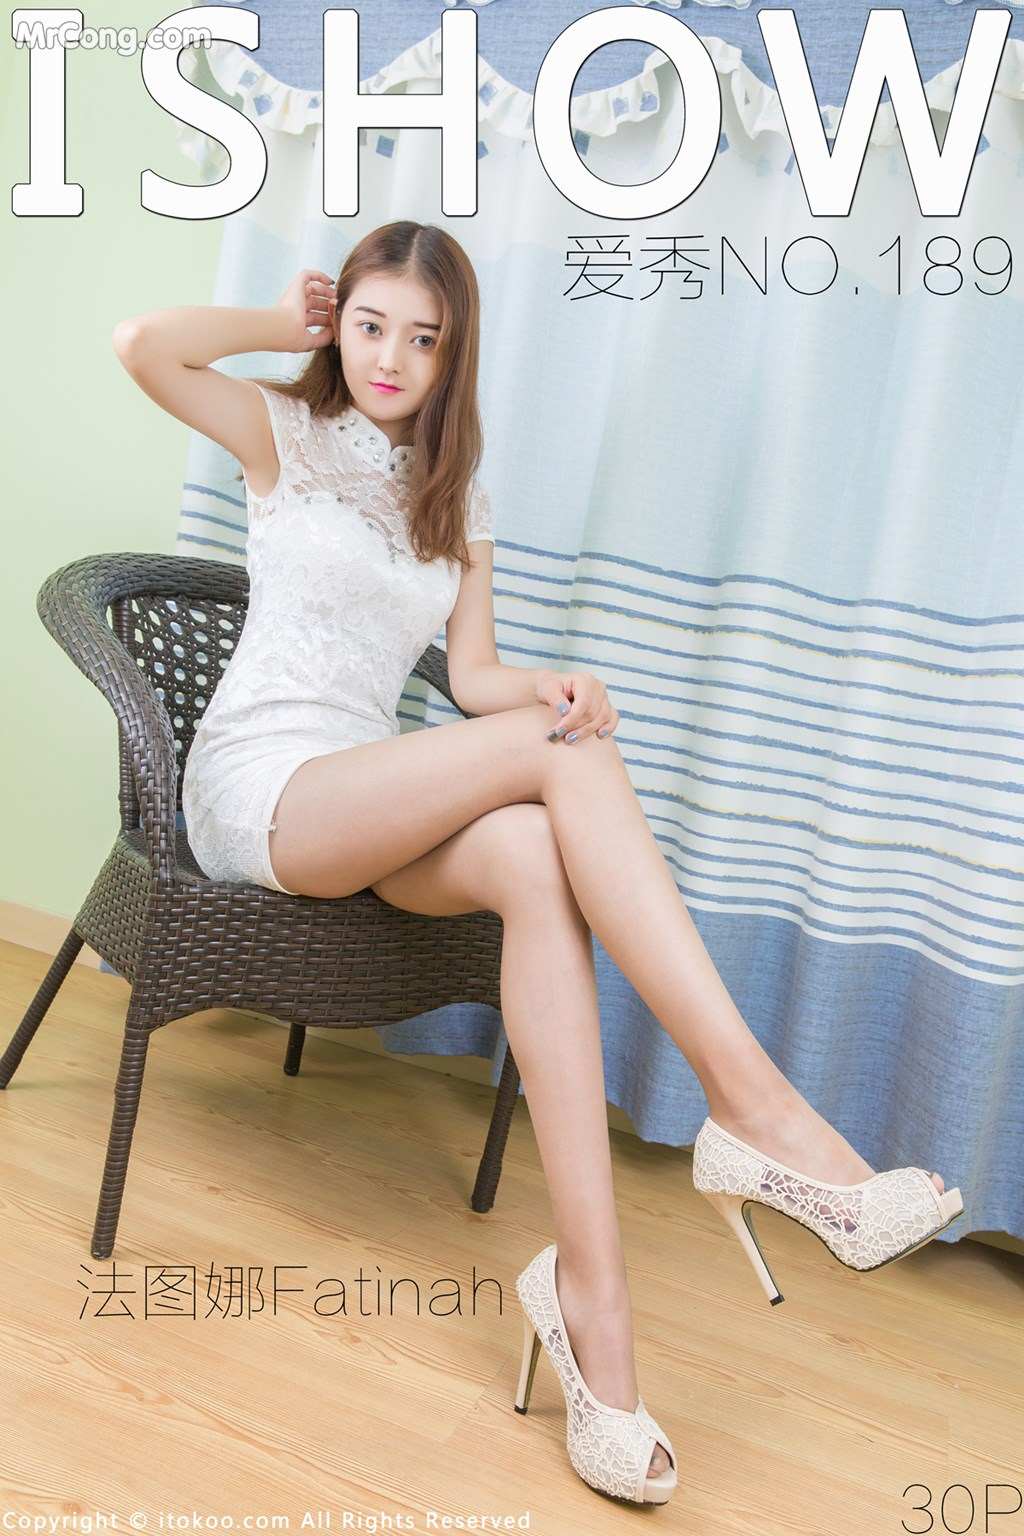 ISHOW No.189: Người mẫu 法图娜Fatinah (31 ảnh)